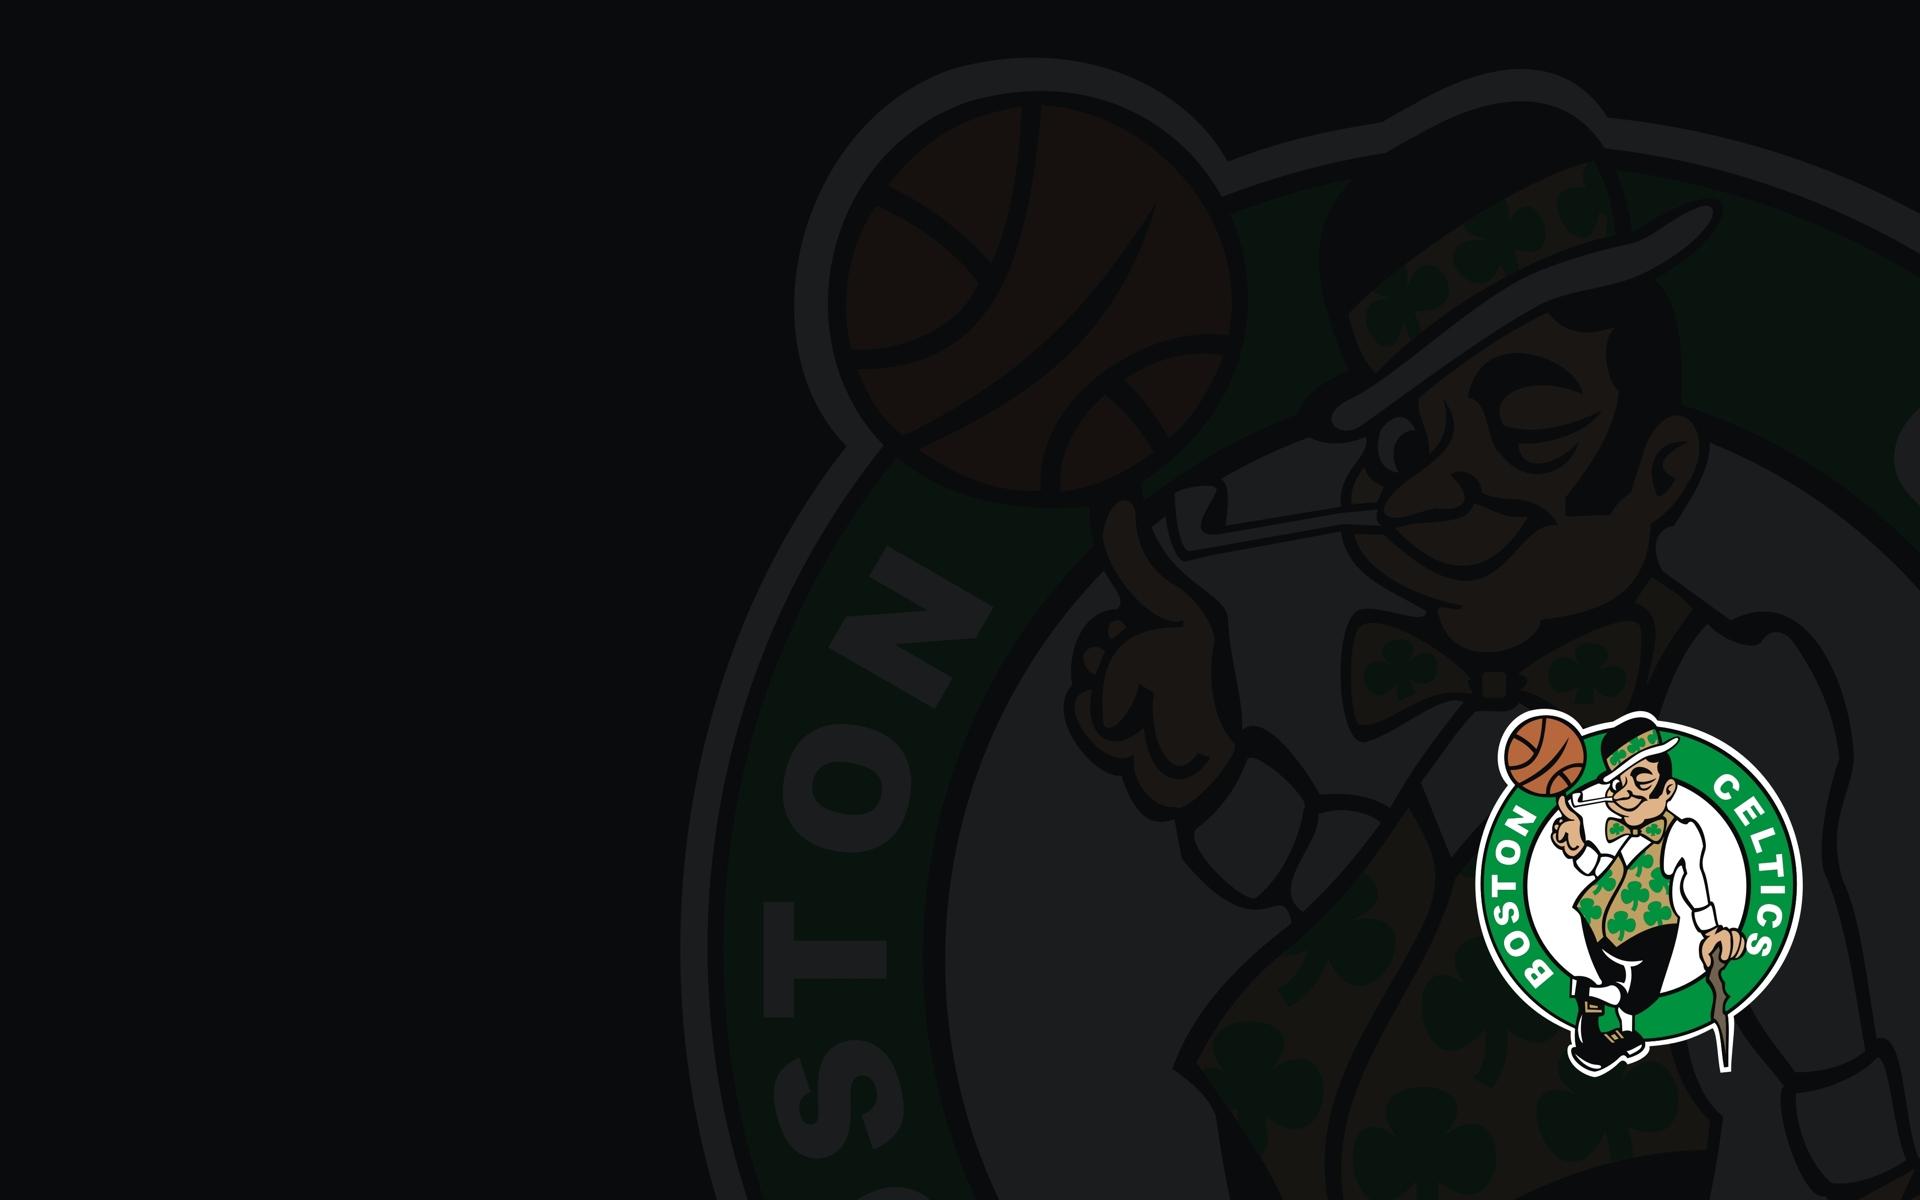 Boston Celtics Wallpapers Hd Wallpapers 1920x1200